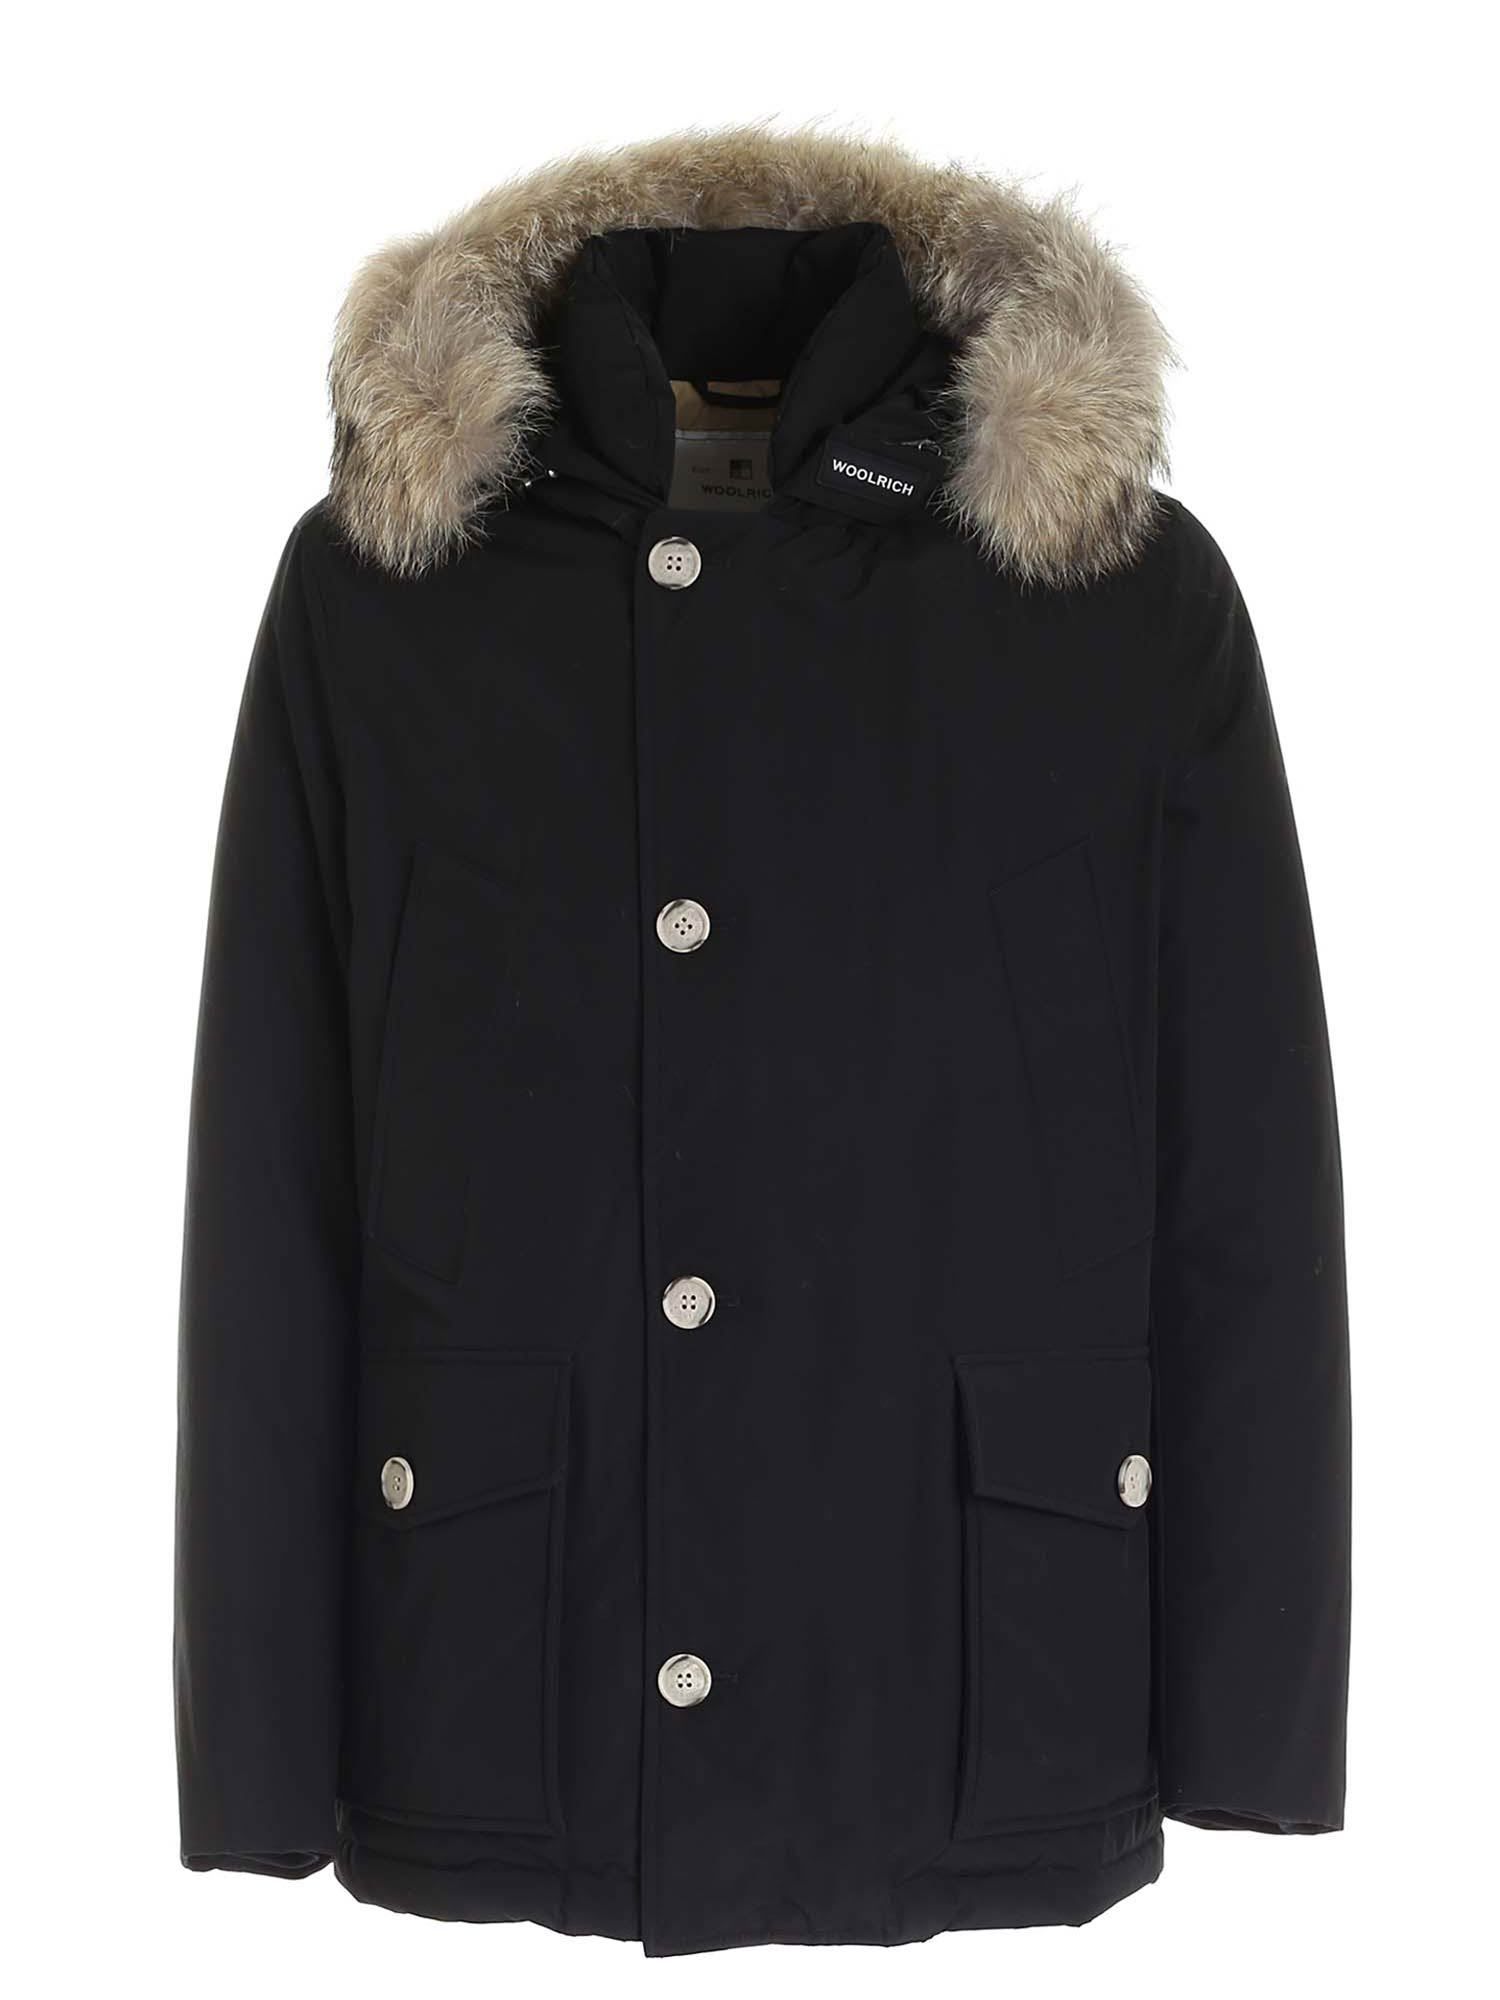 Woolrich Artic Anorak